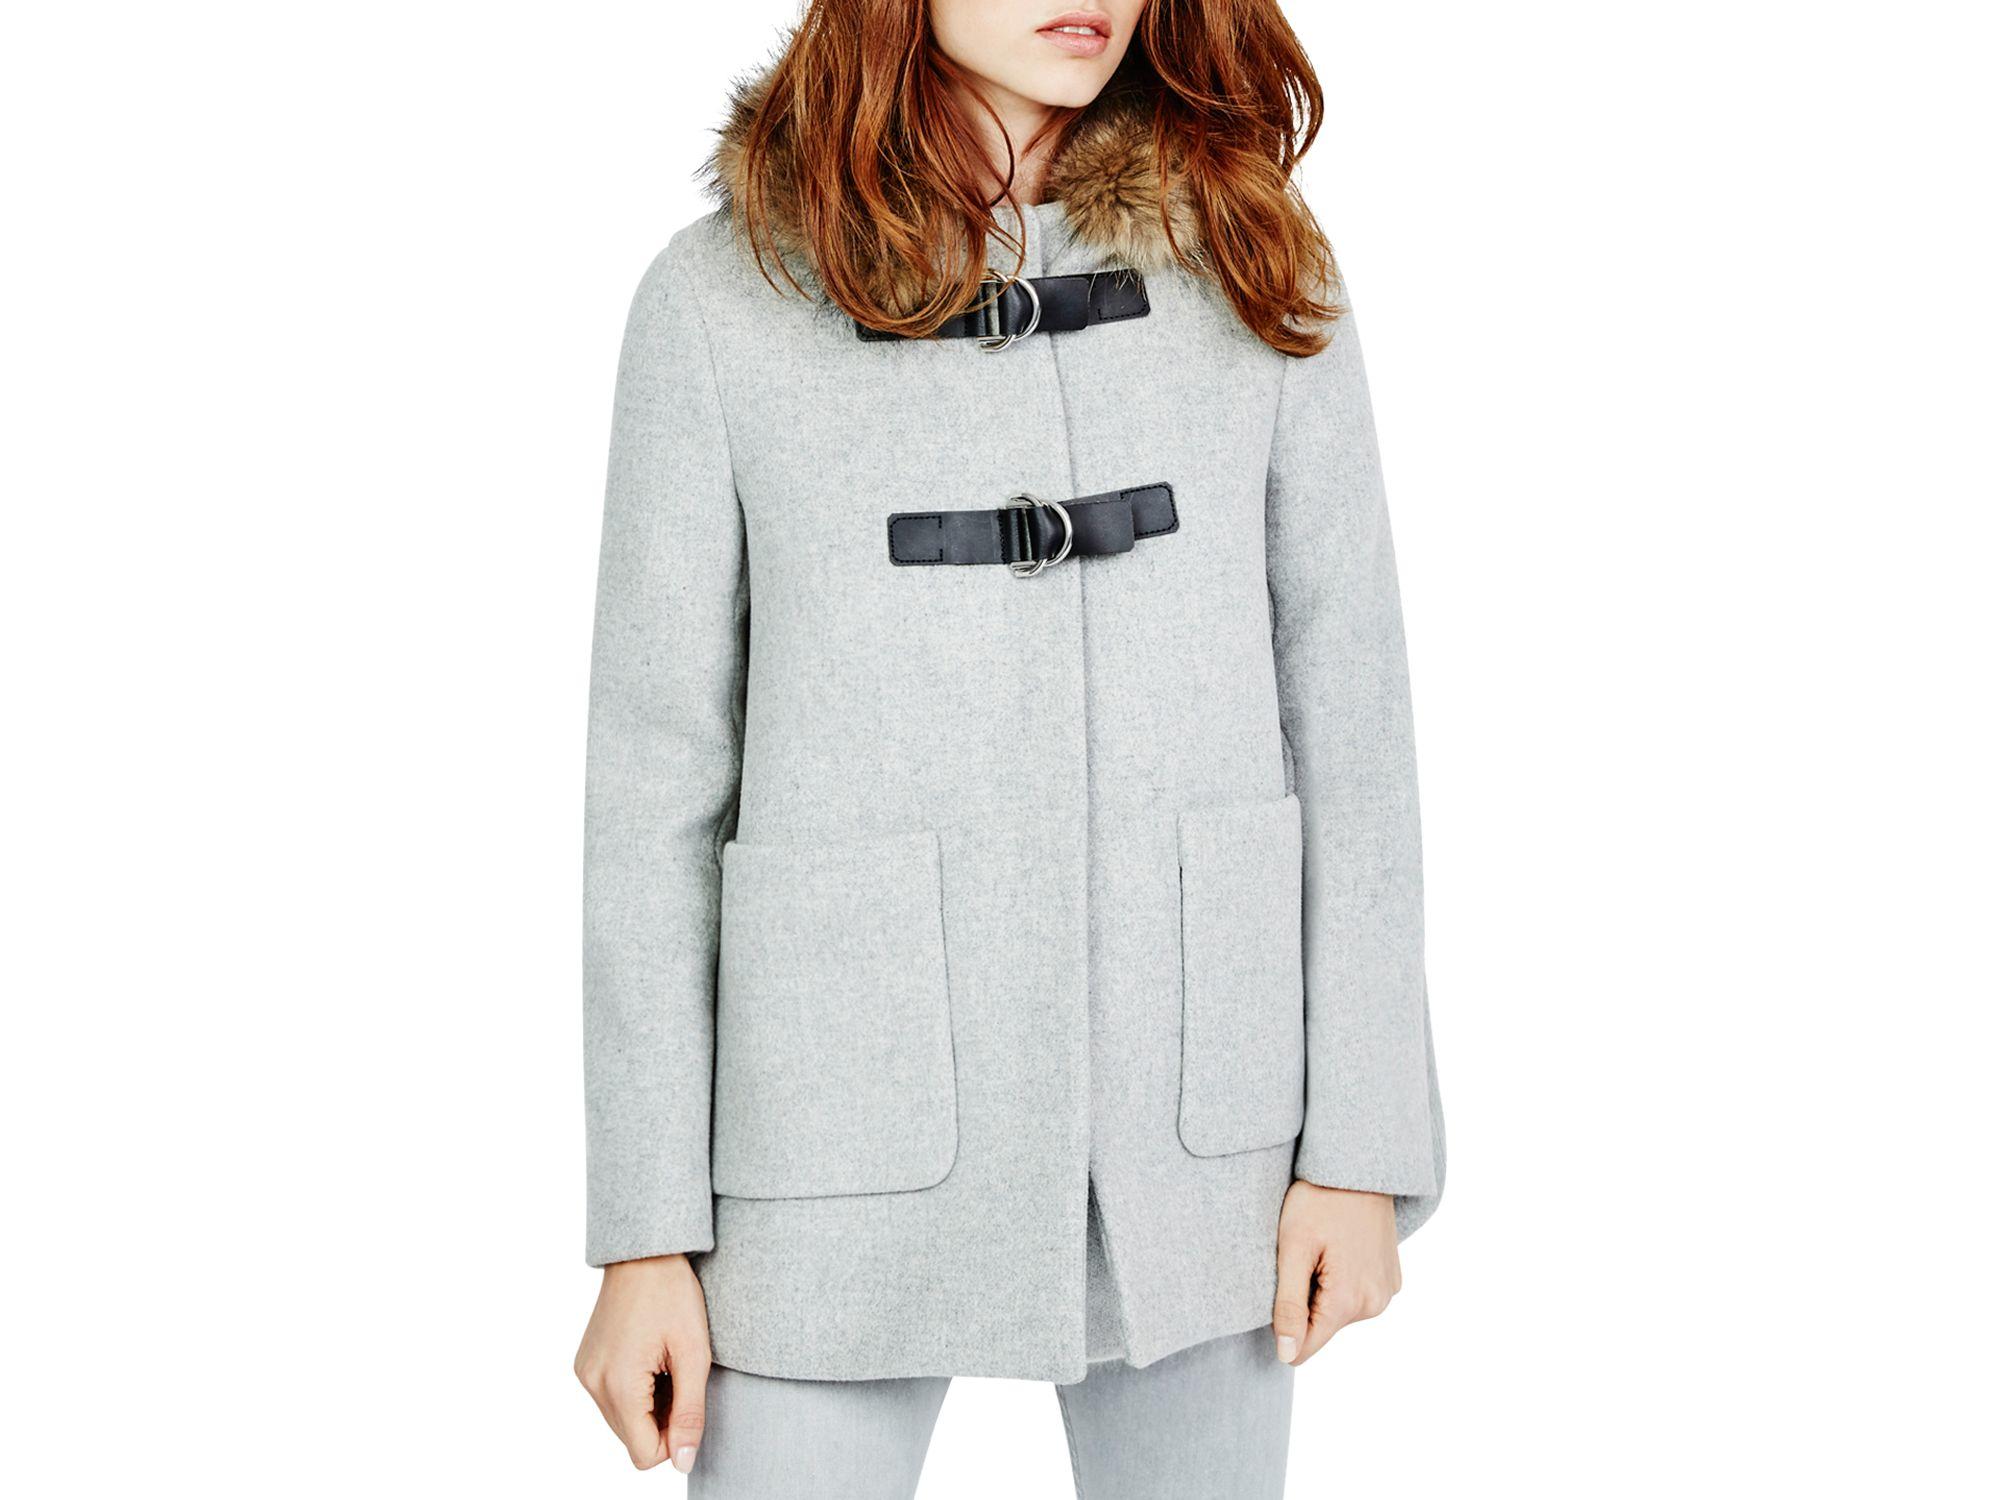 Maje Gatita Fur Trimmed Swing Coat in Gray | Lyst